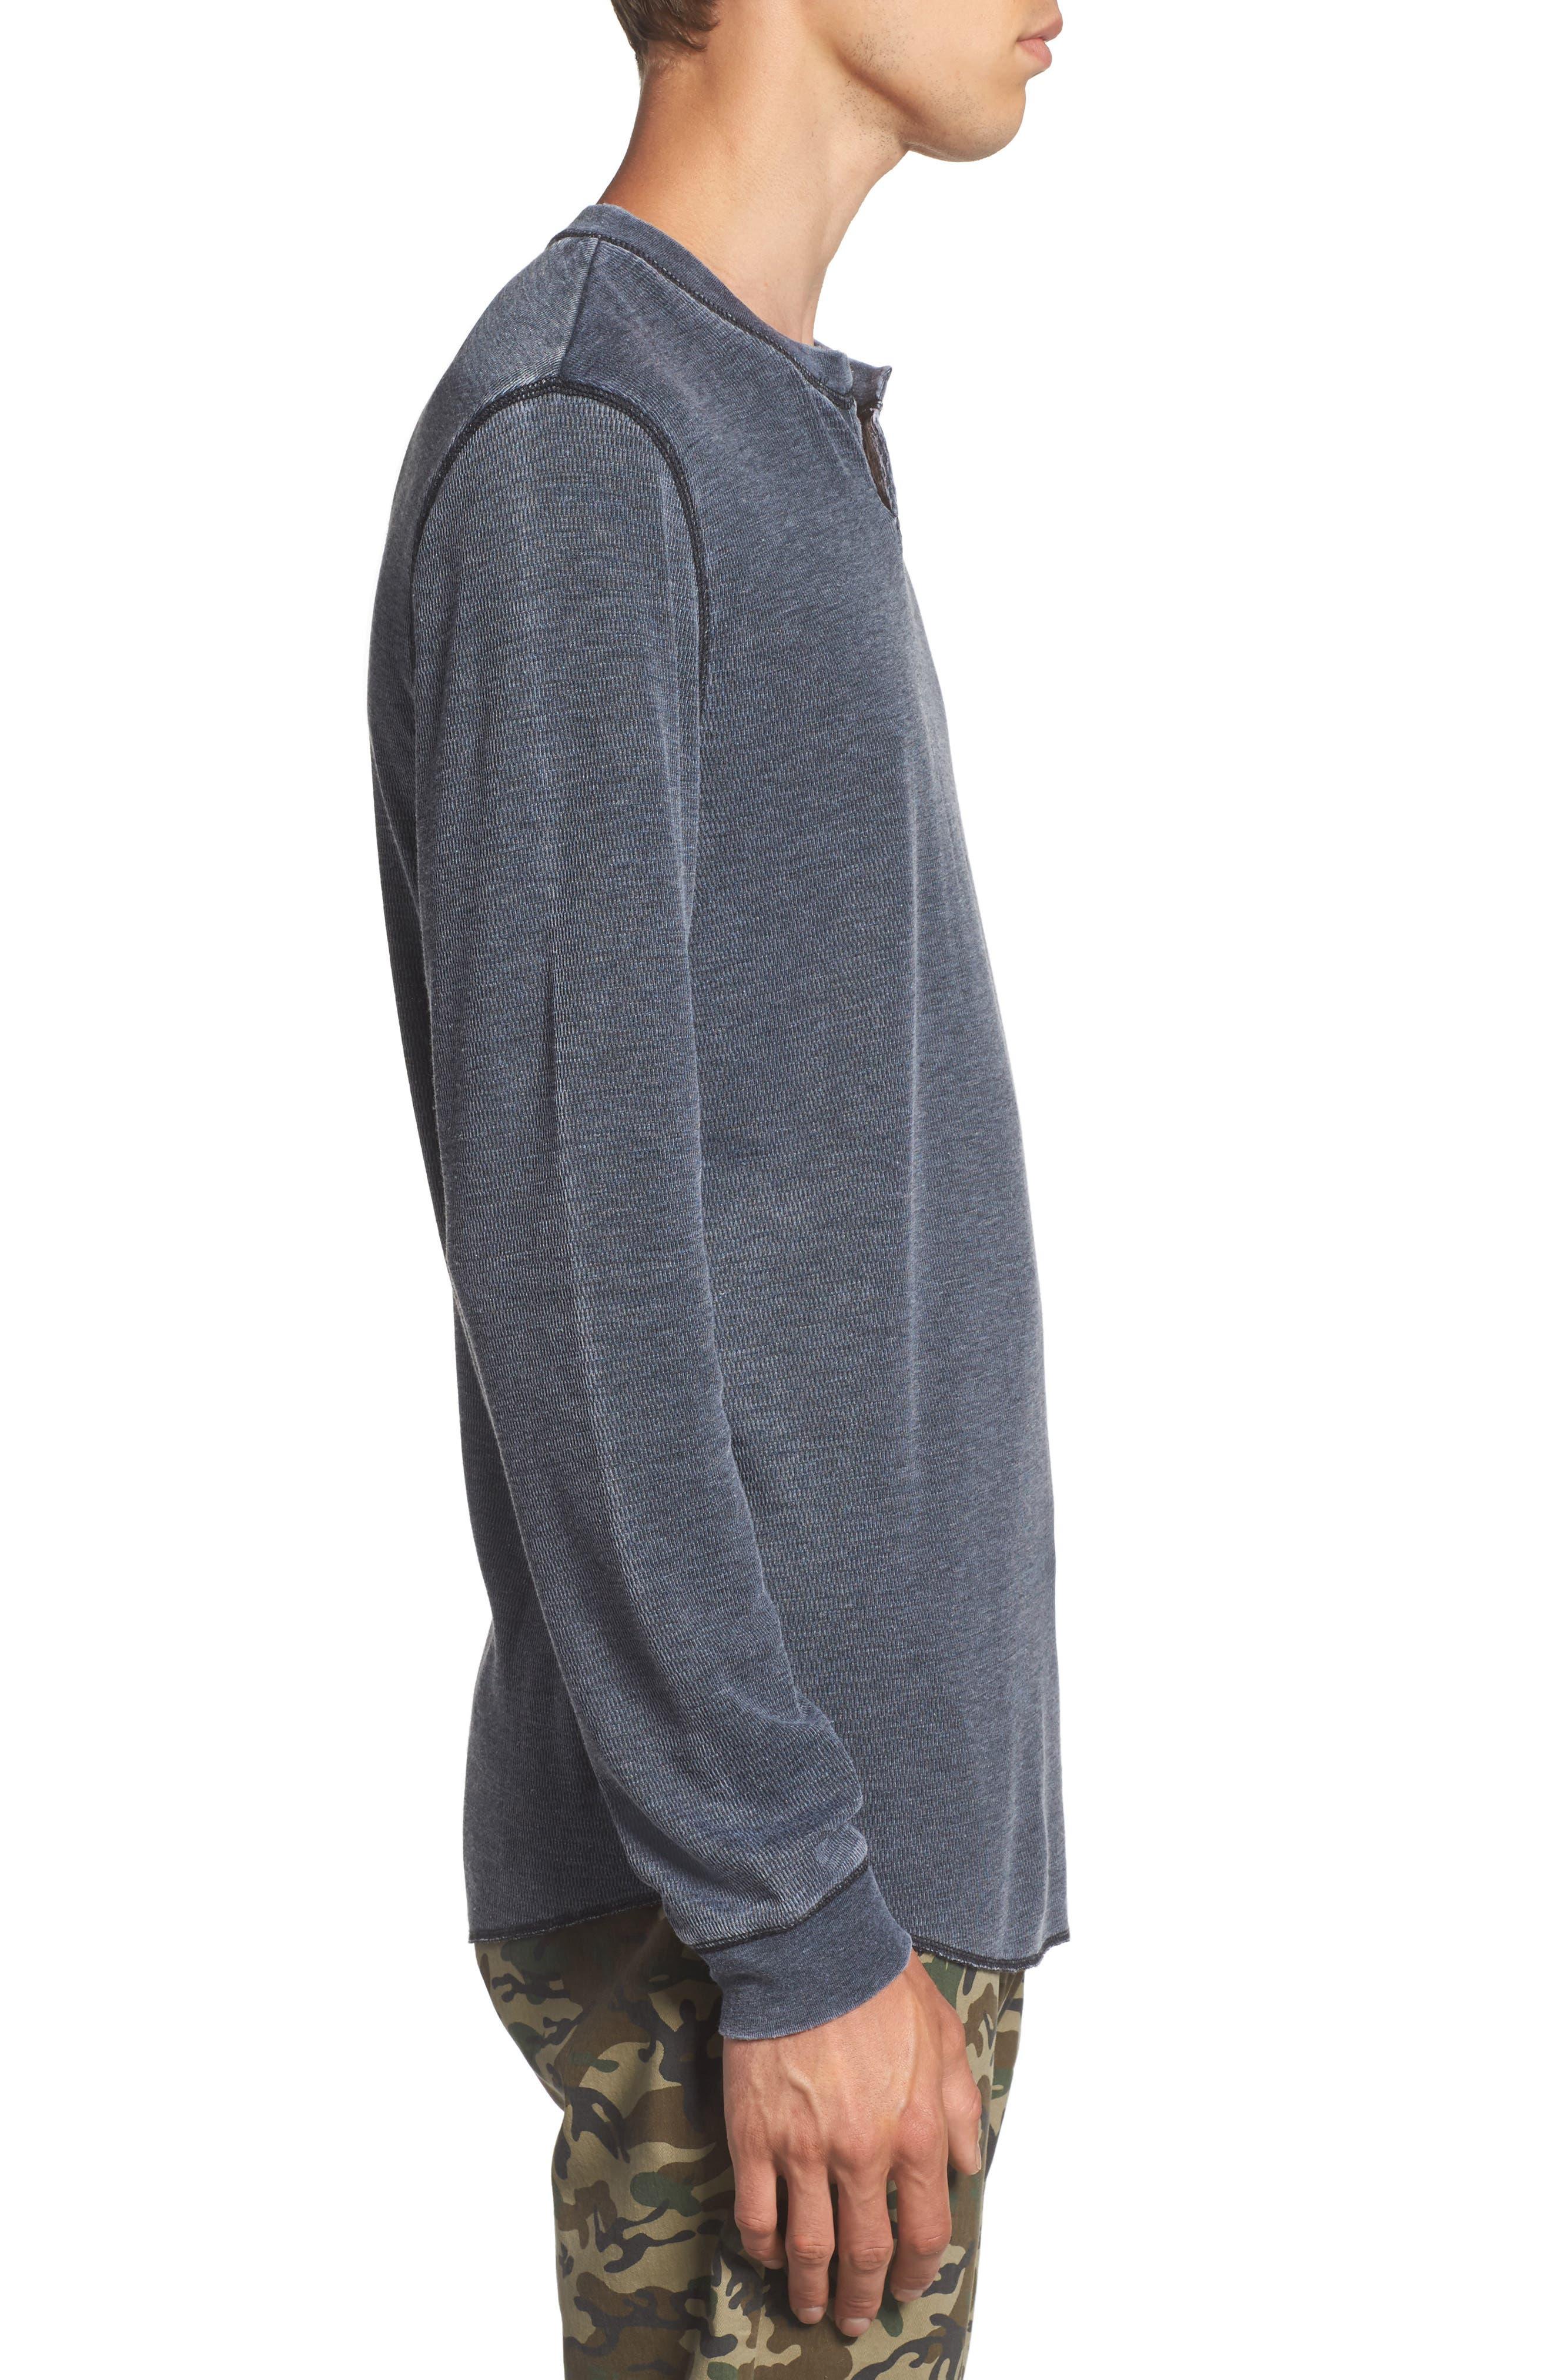 Notch Neck Thermal T-Shirt,                             Alternate thumbnail 3, color,                             Black/ White Burnout